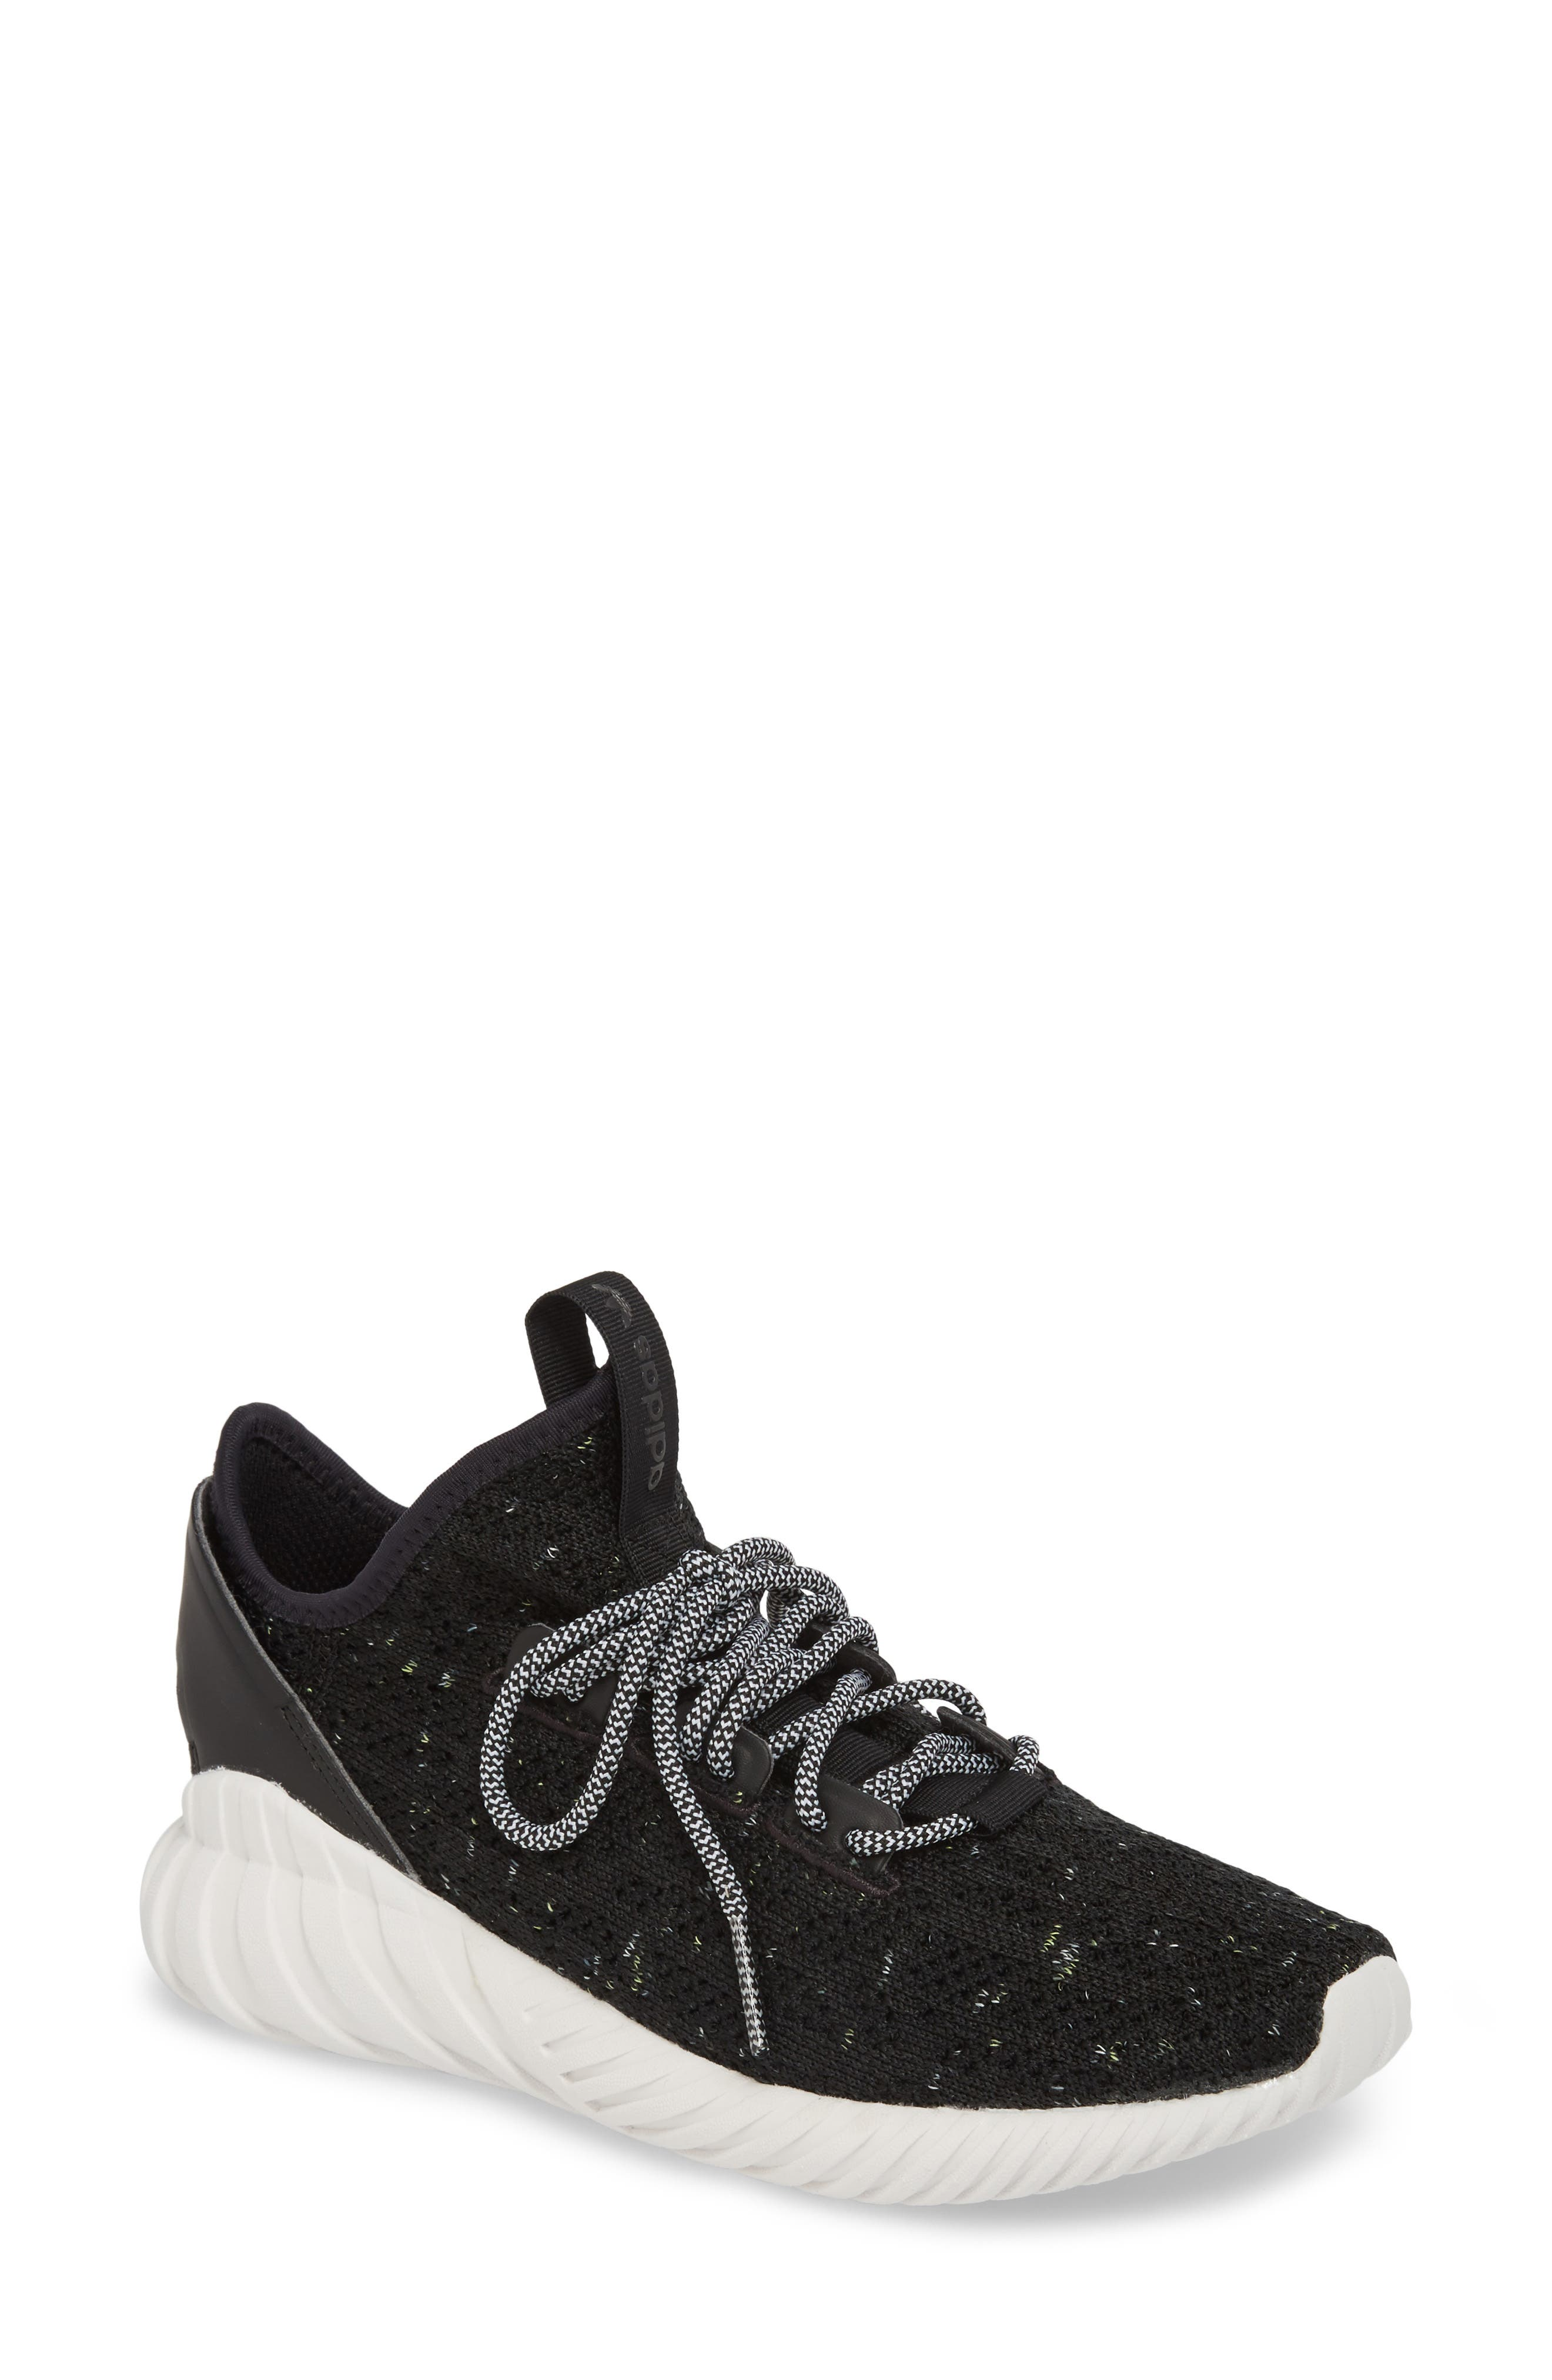 Main Image - adidas Tubular Doom Sock Primeknit Sneaker (Women)